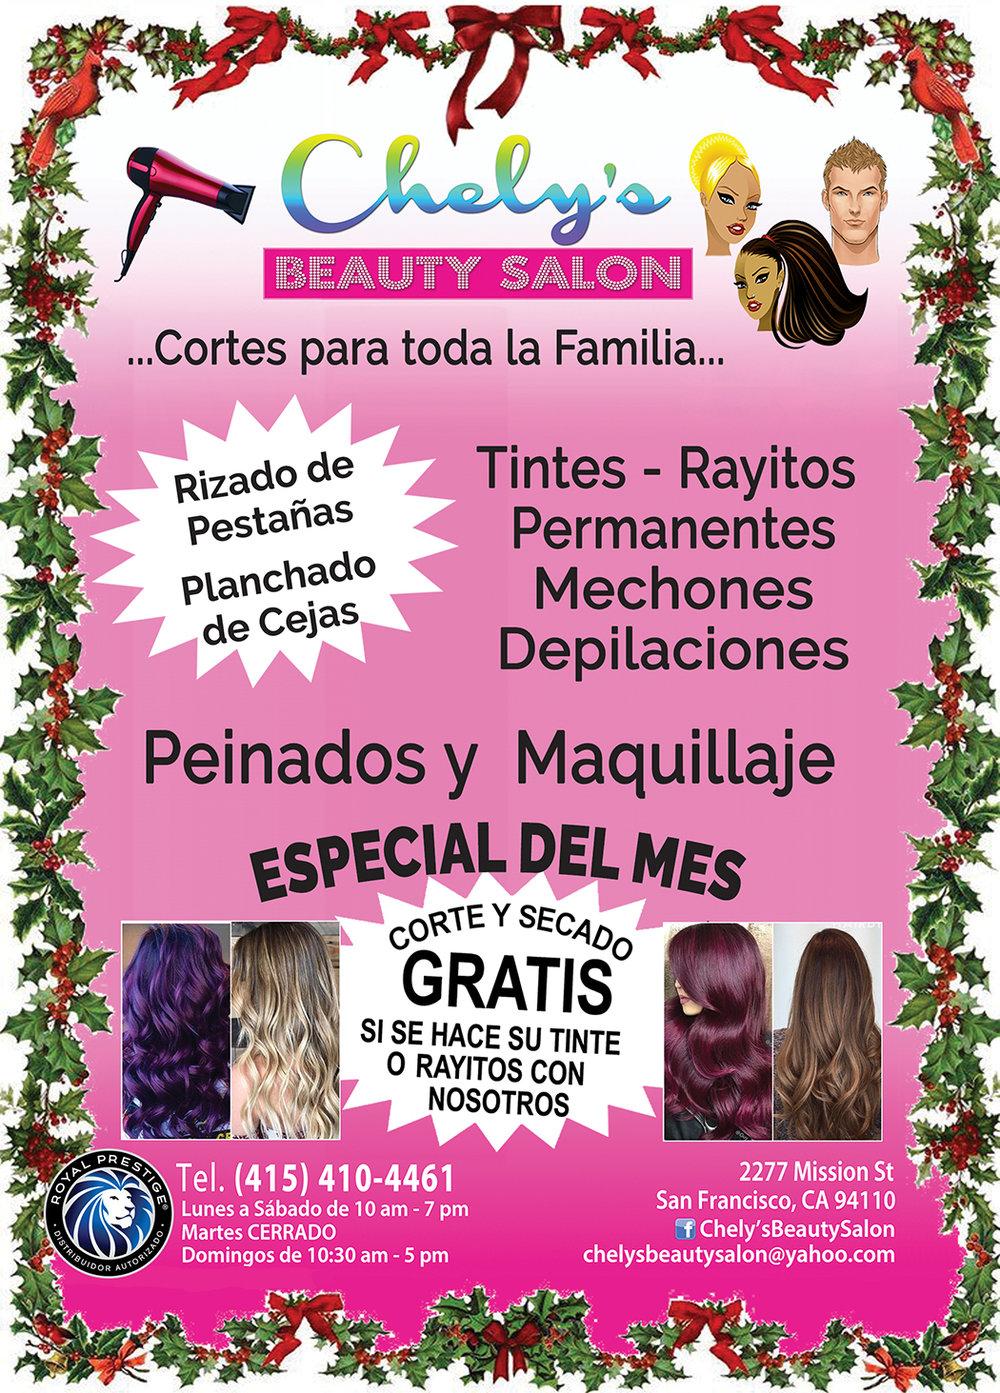 Chelys Beauty Salon 1 pagina DICIEMBRE 2018 - 2.jpg